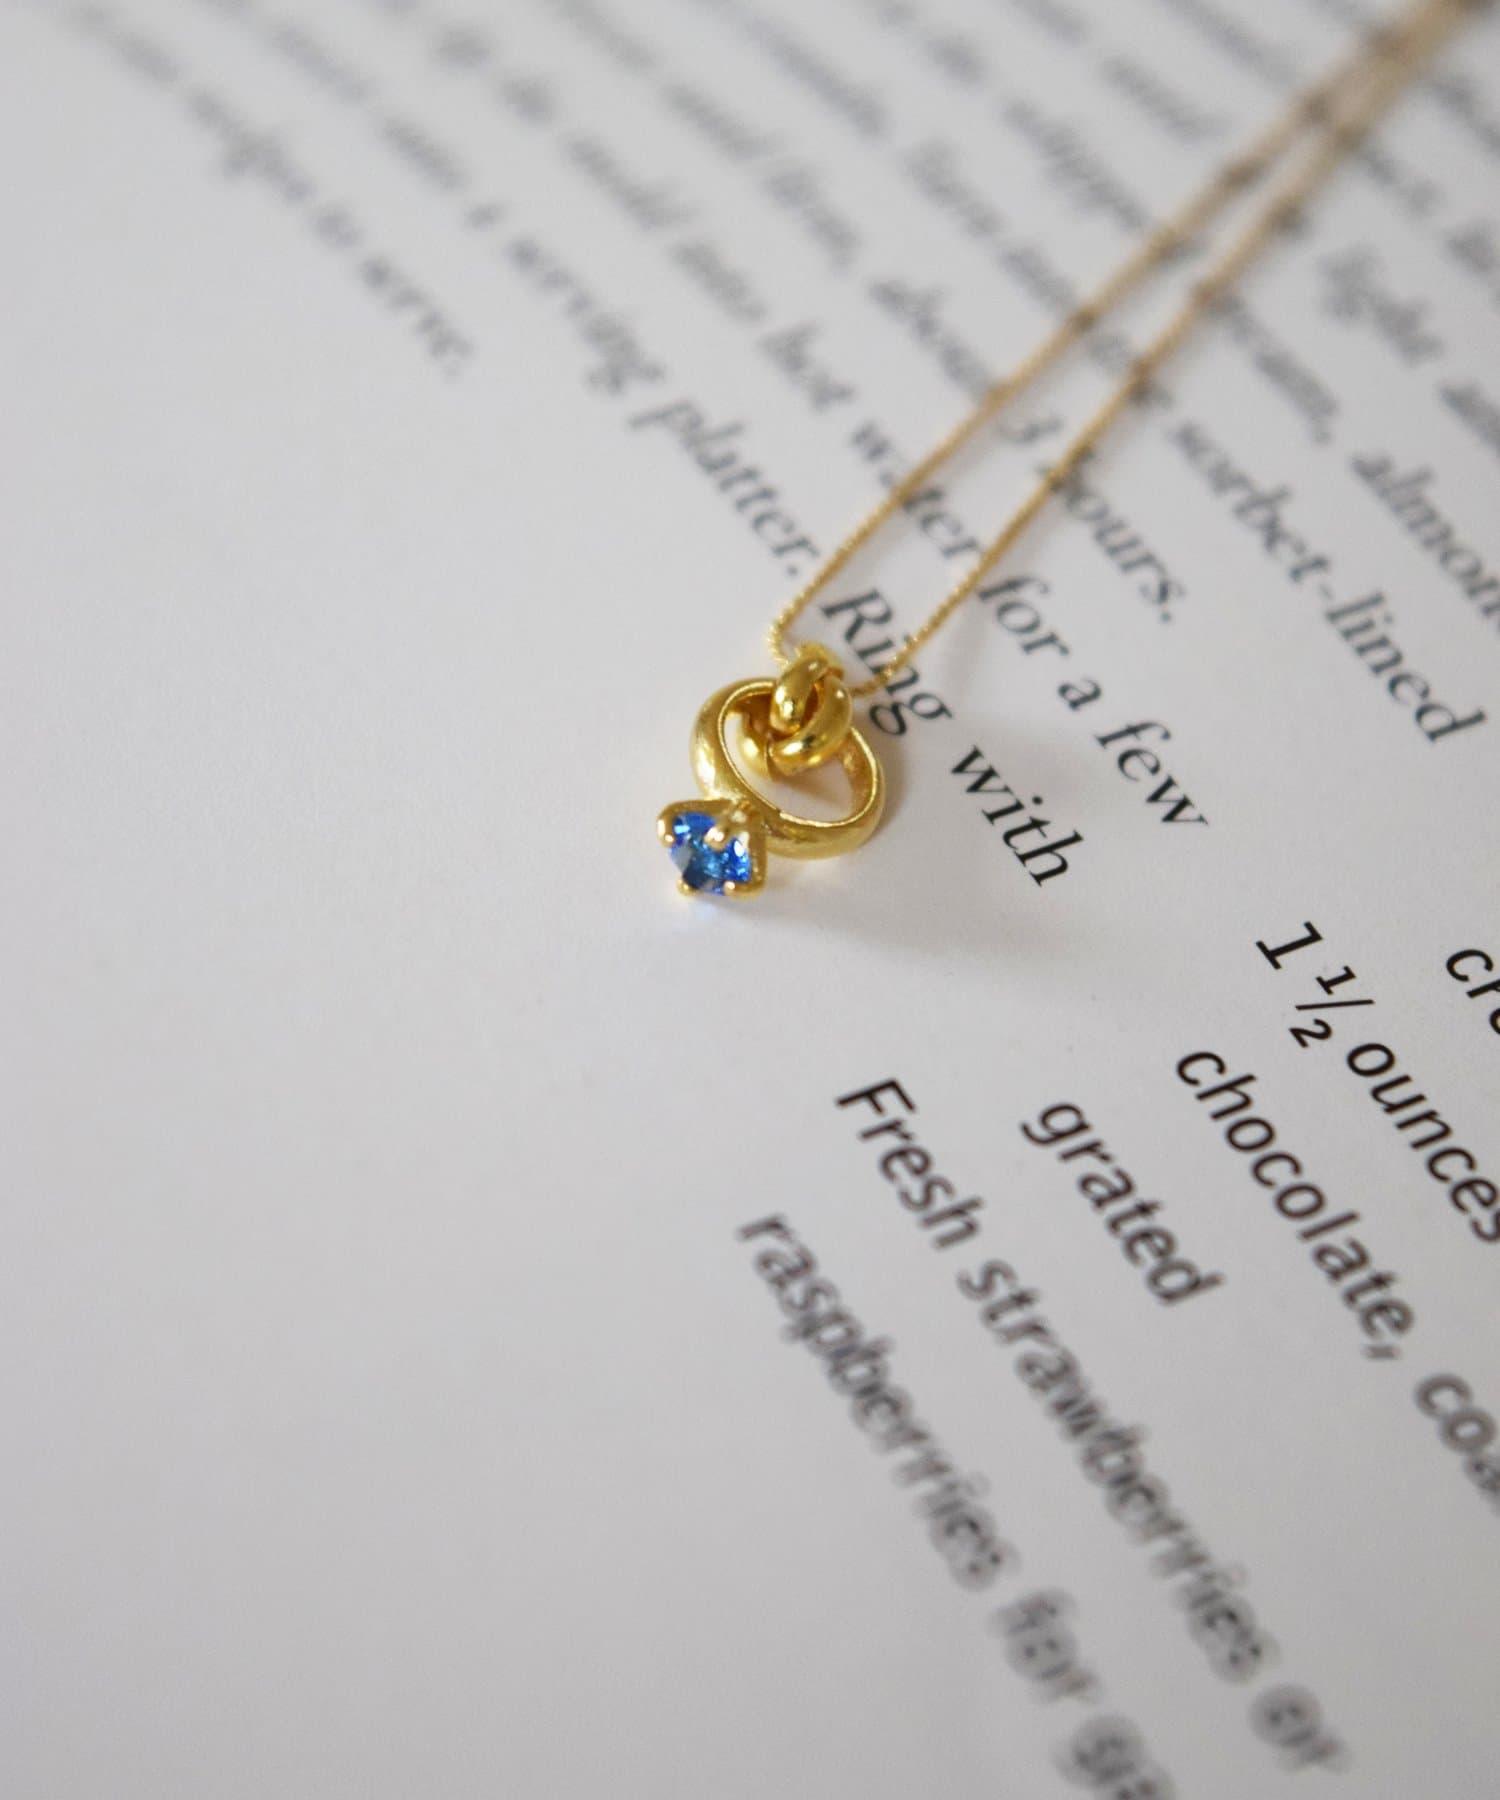 BIRTHDAY BAR(バースデイバー) レディース Birthstone Petit Ring Necklace 誕生石ネックレス ロイヤルブルー